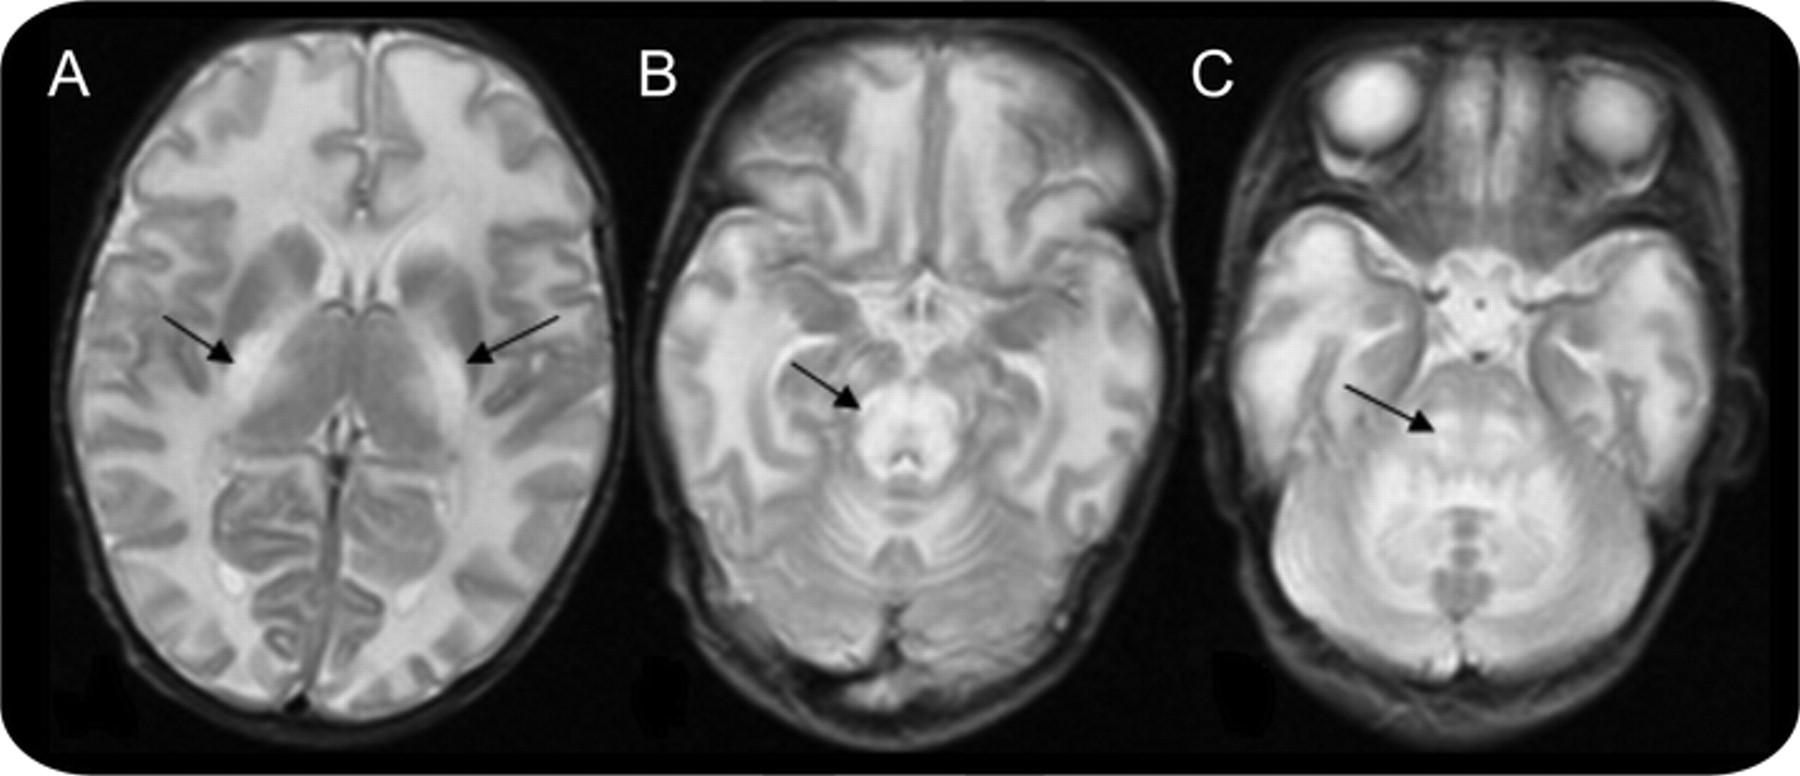 Teaching Neuroimages Mri In Maple Syrup Urine Disease